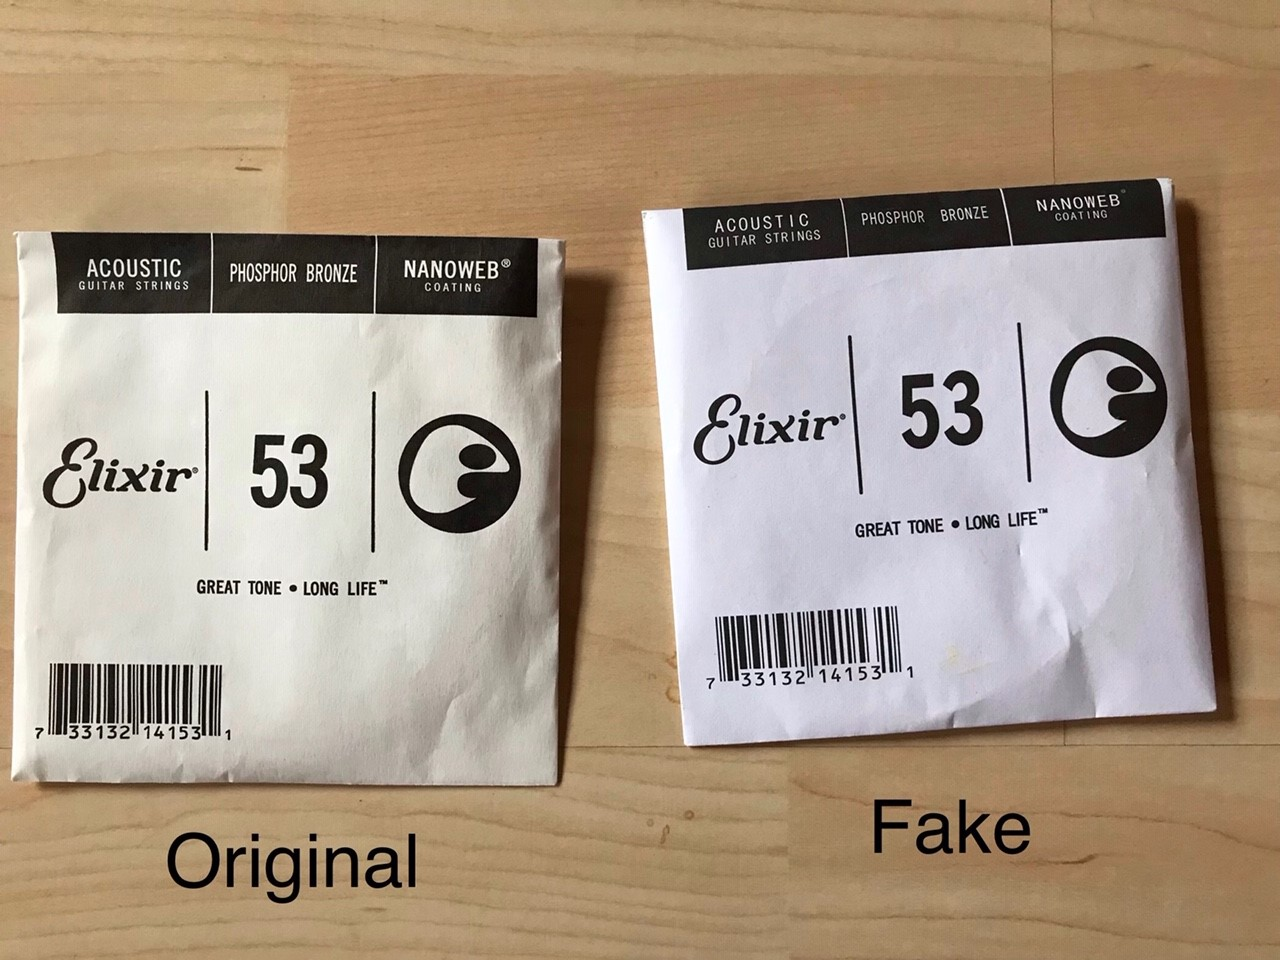 Beware of counterfeiting: Elixir Nanoweb guitar strings fakes at Amazon Marketplace